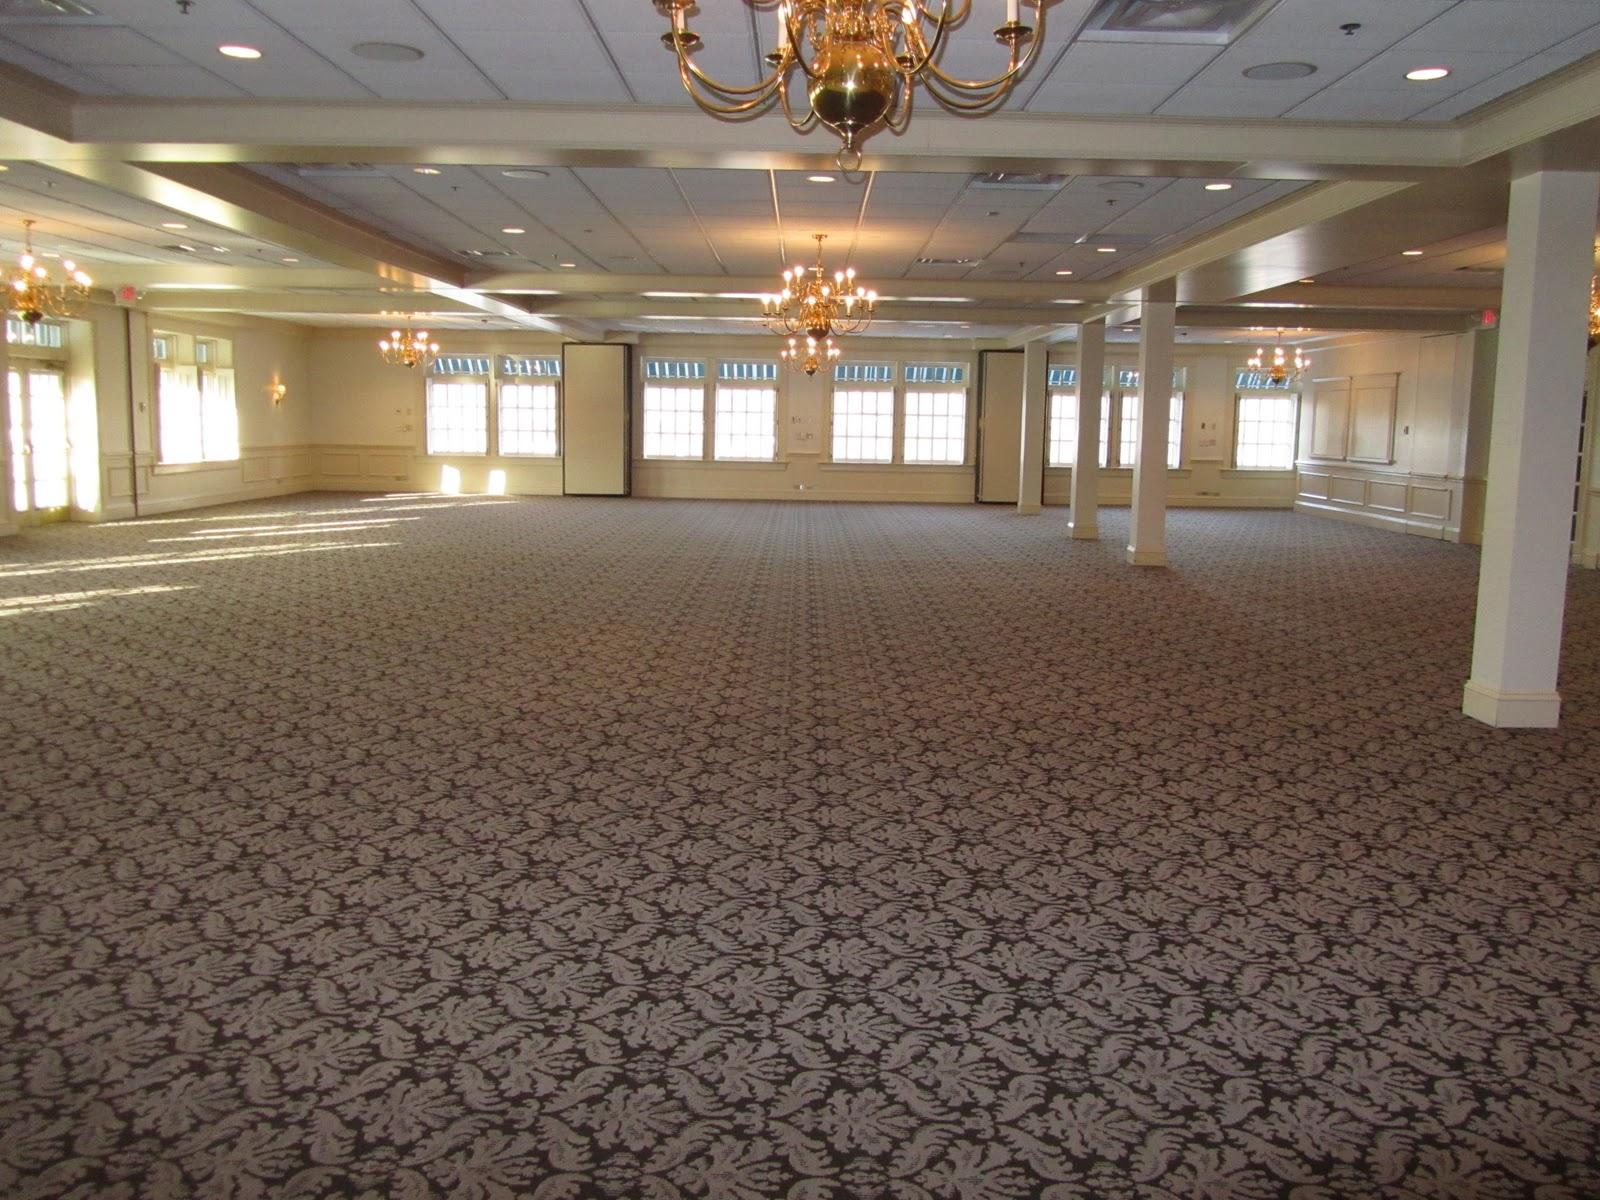 Edina Country Club Ballroom Renovation